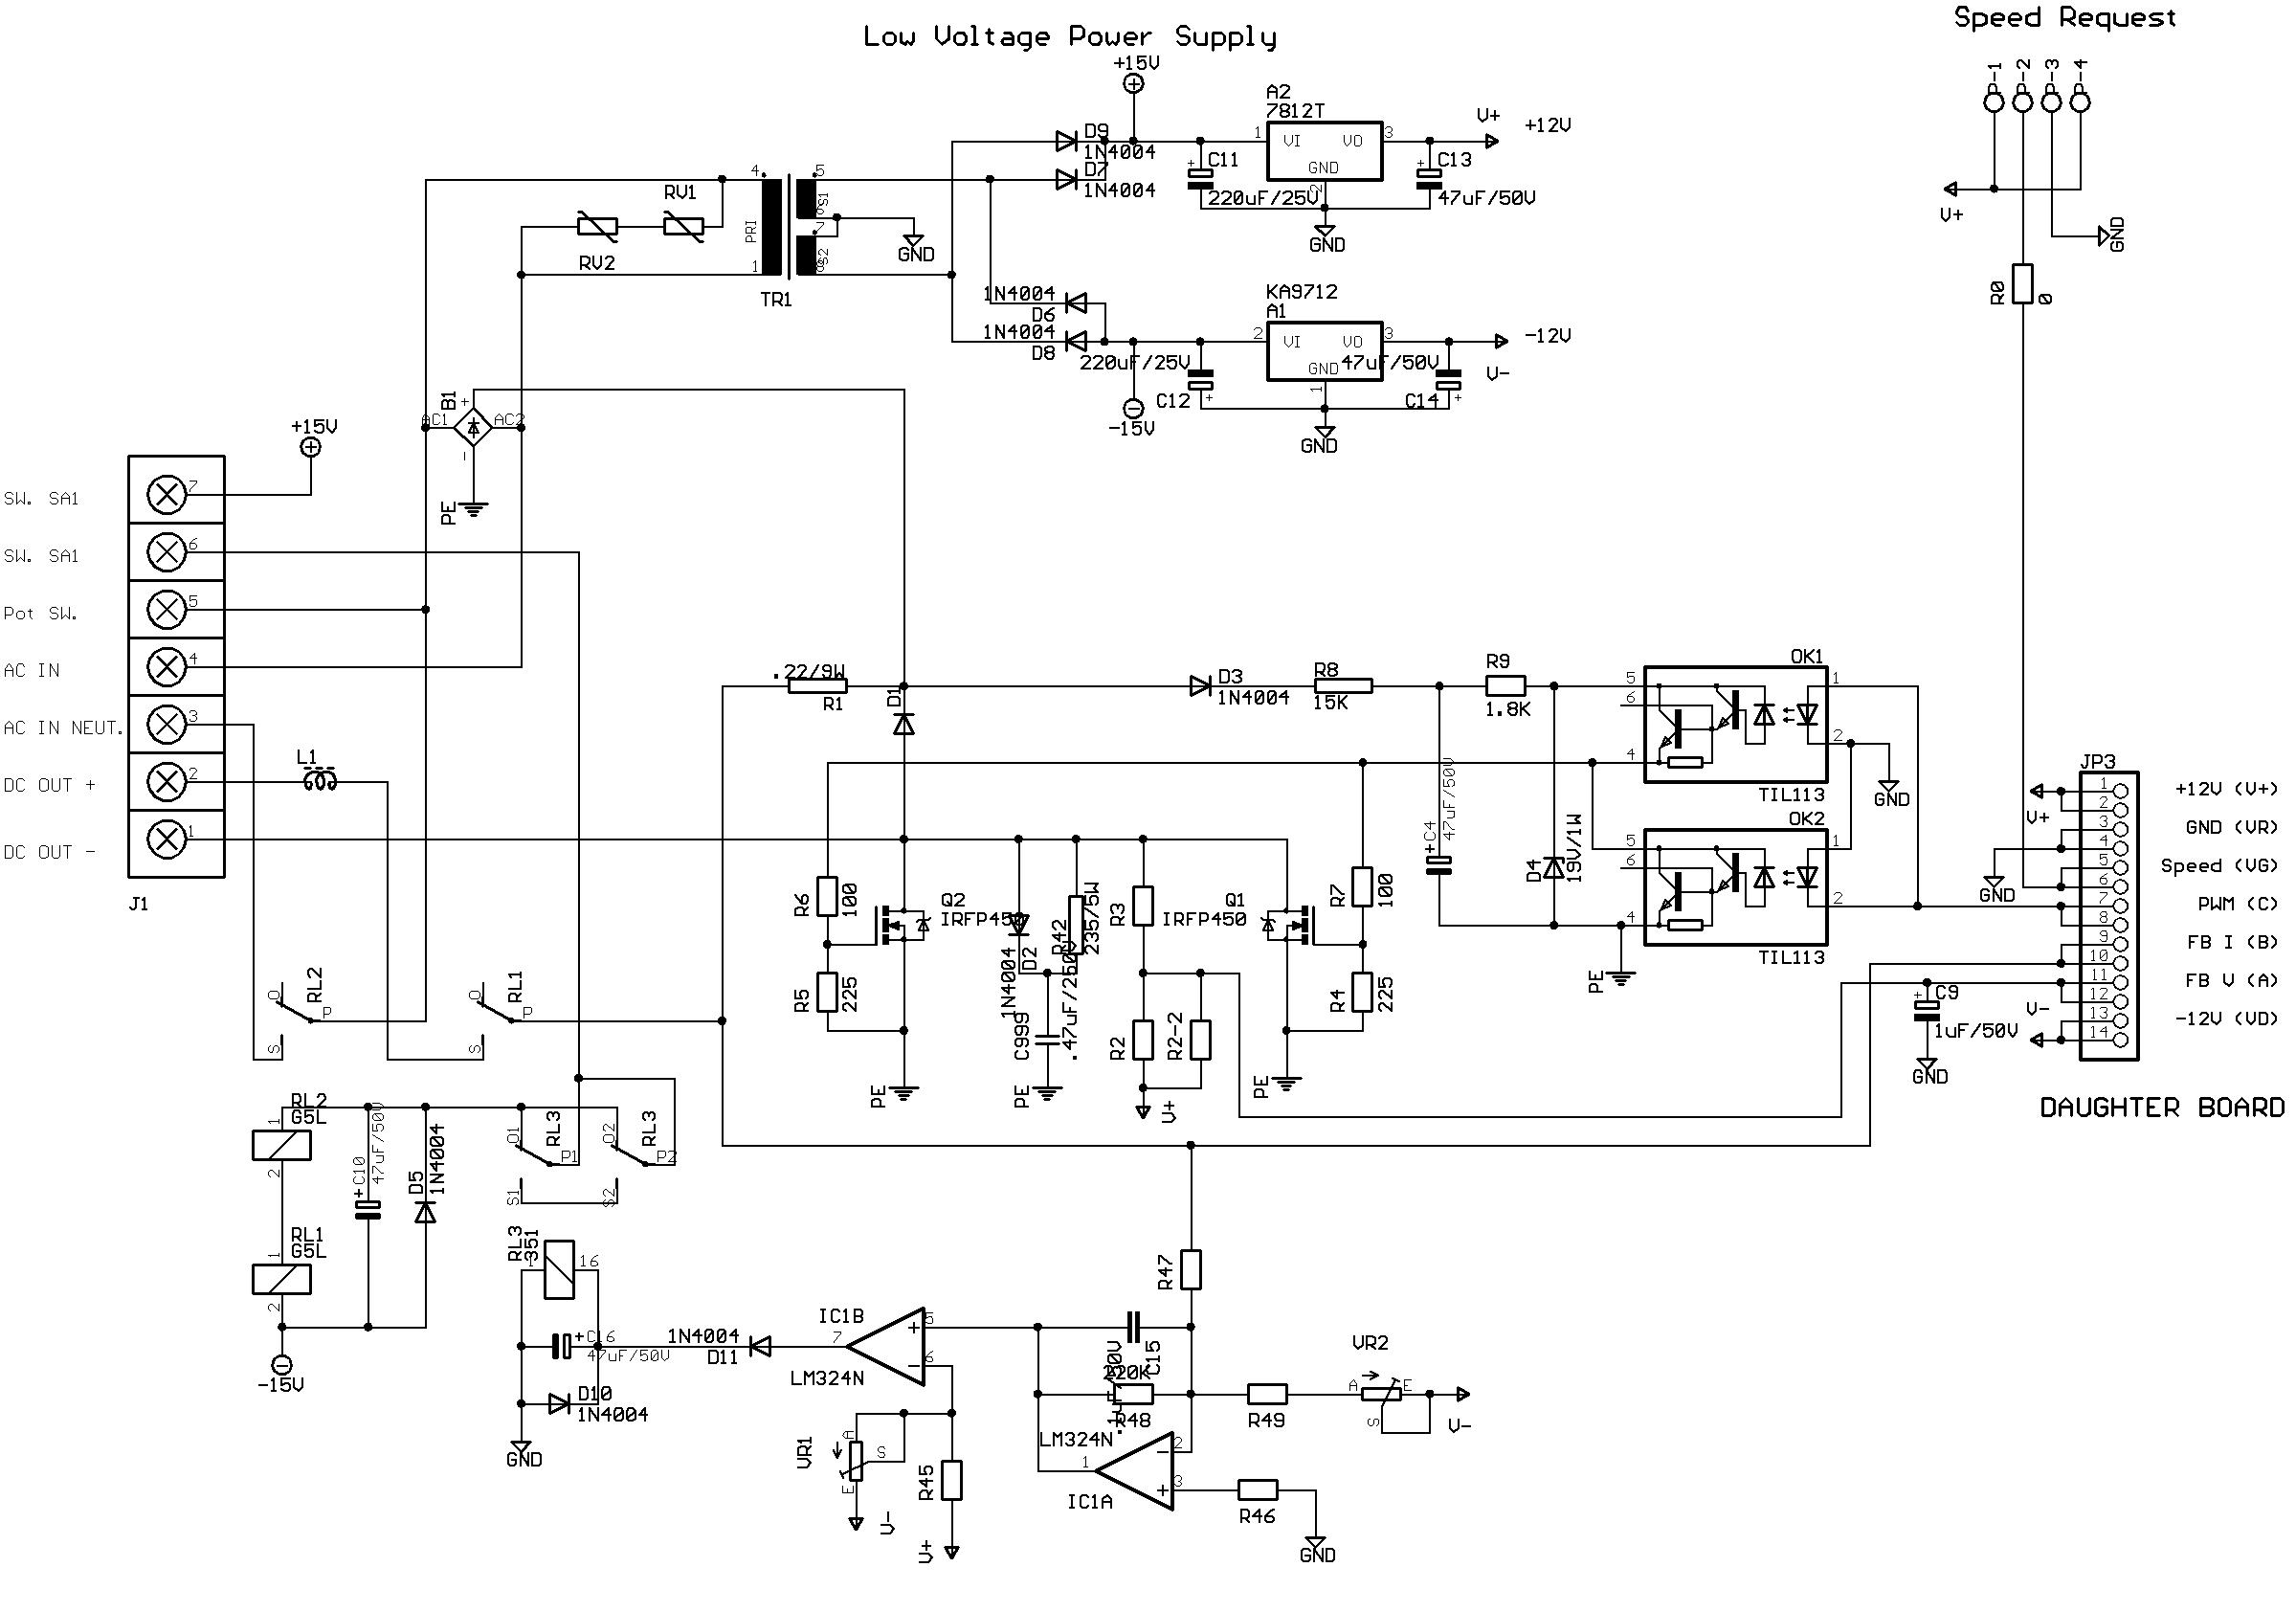 Motor Controller Repair Constant Speed Pwm Control Circuit Schematic Fc350bj Sch Main Board